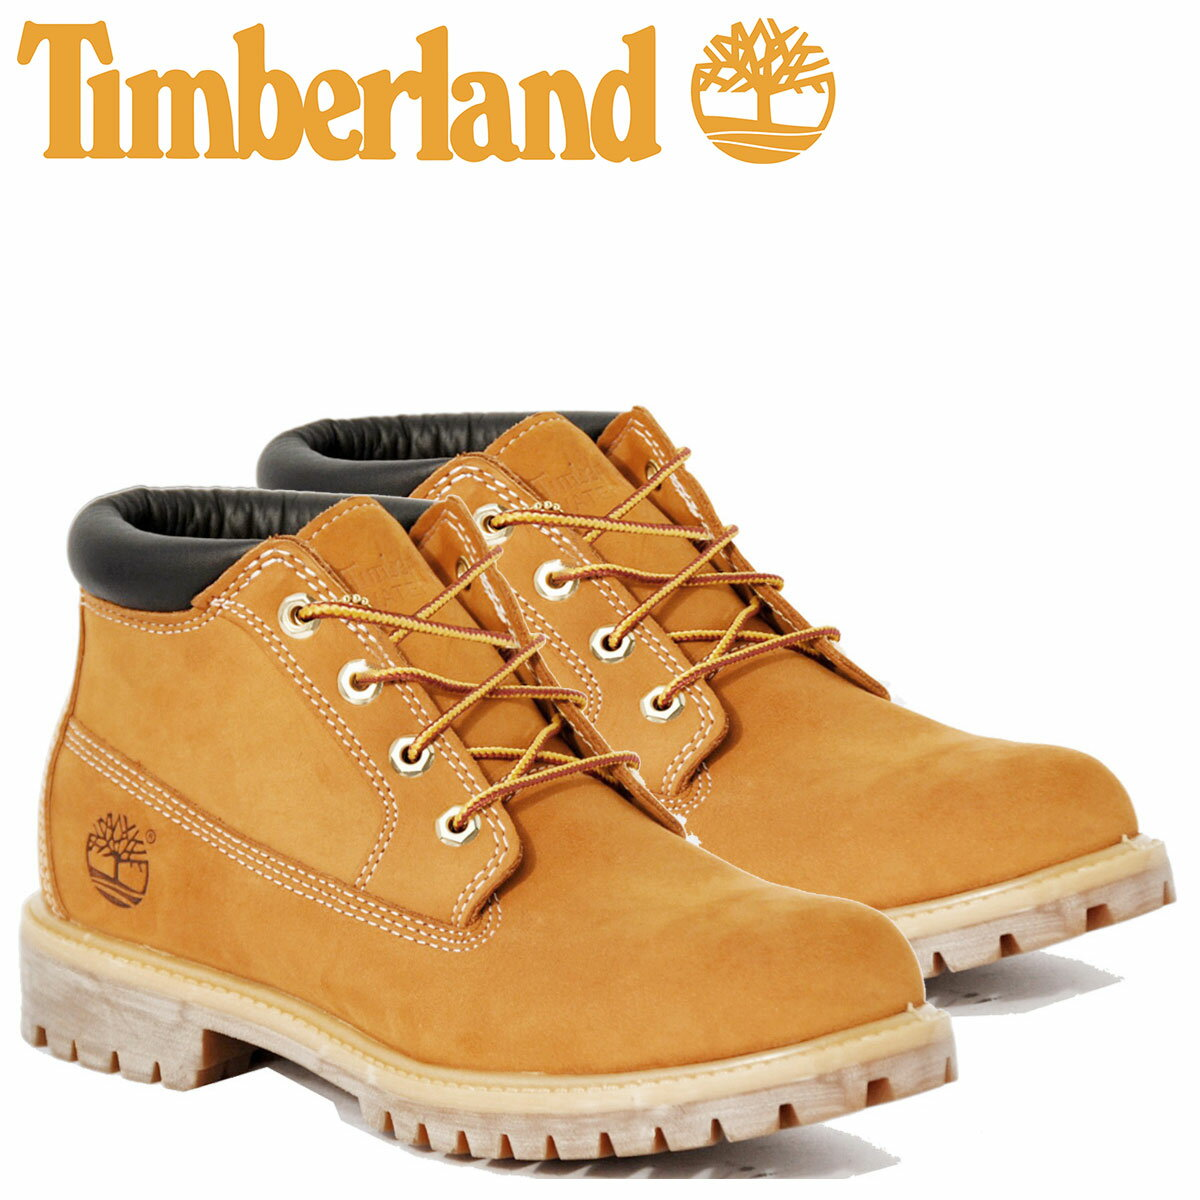 Timberland ブーツ チャッカ メンズ ティンバーランド WATERPROOF CHUKKA BOOT 23061 Wワイズ 防水 [予約商品 1/20頃入荷予定 追加入荷]